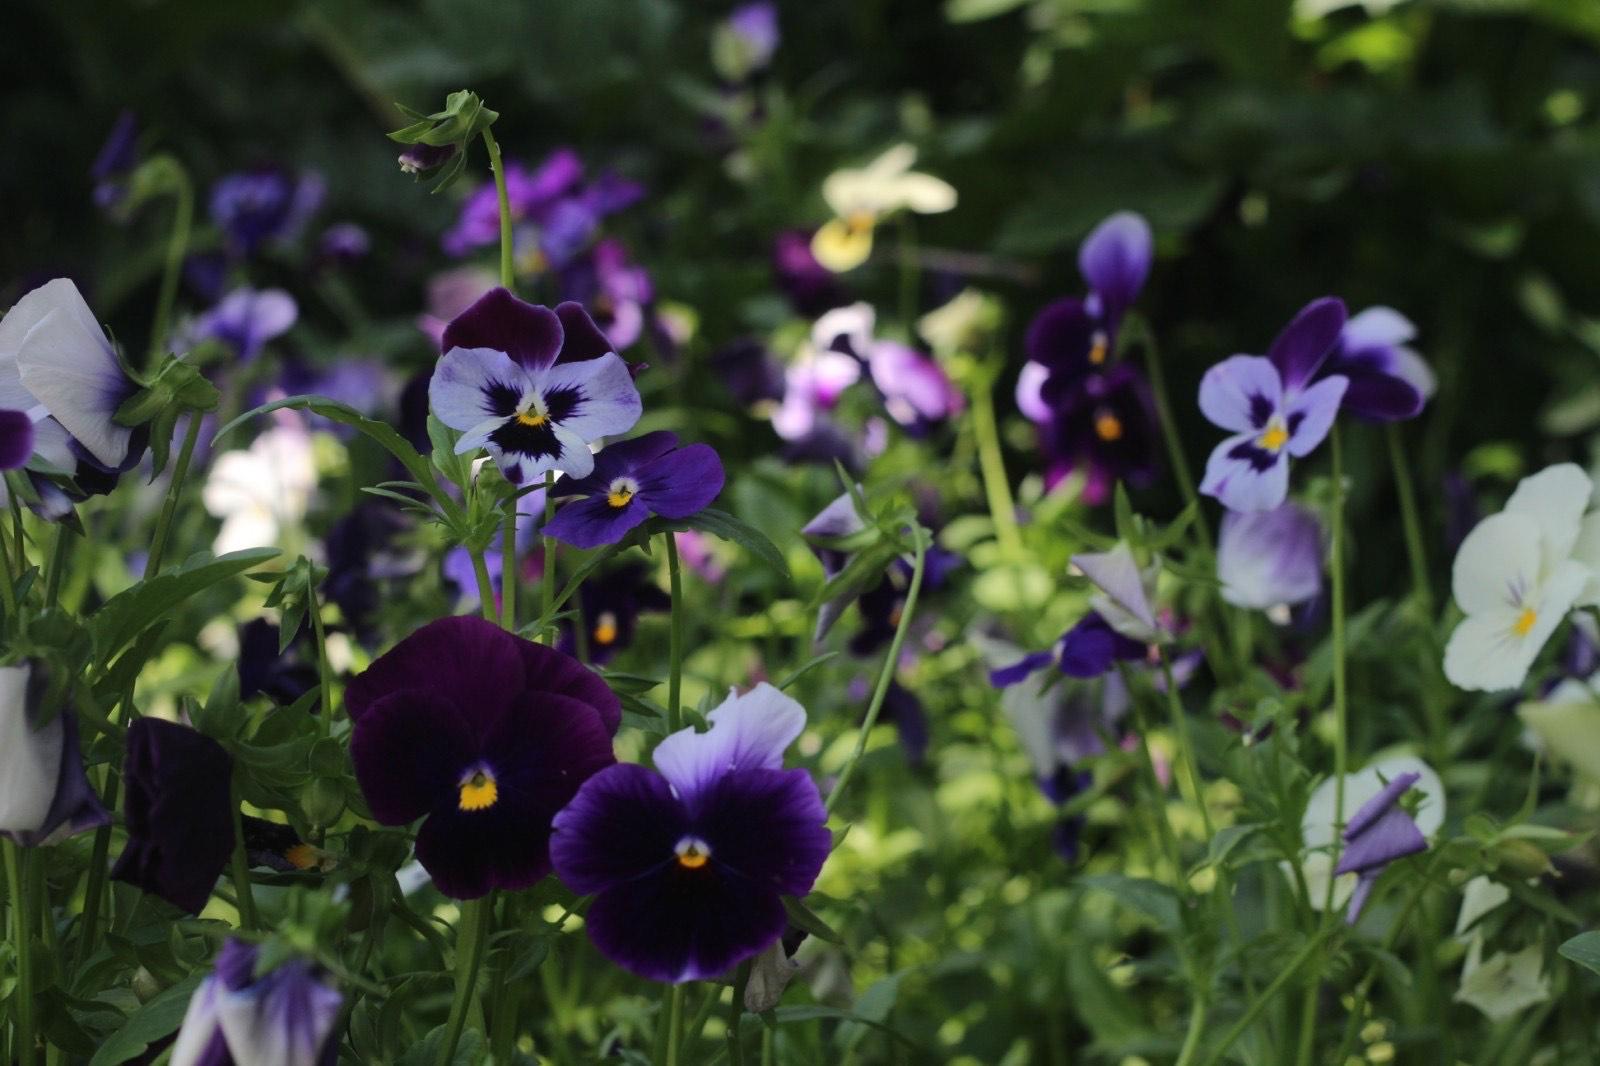 IMG 2482 Другая SOVA Ботаничекий сад, Грузия, тбилиси, Тбилисский ботанический сад, флора, цветы